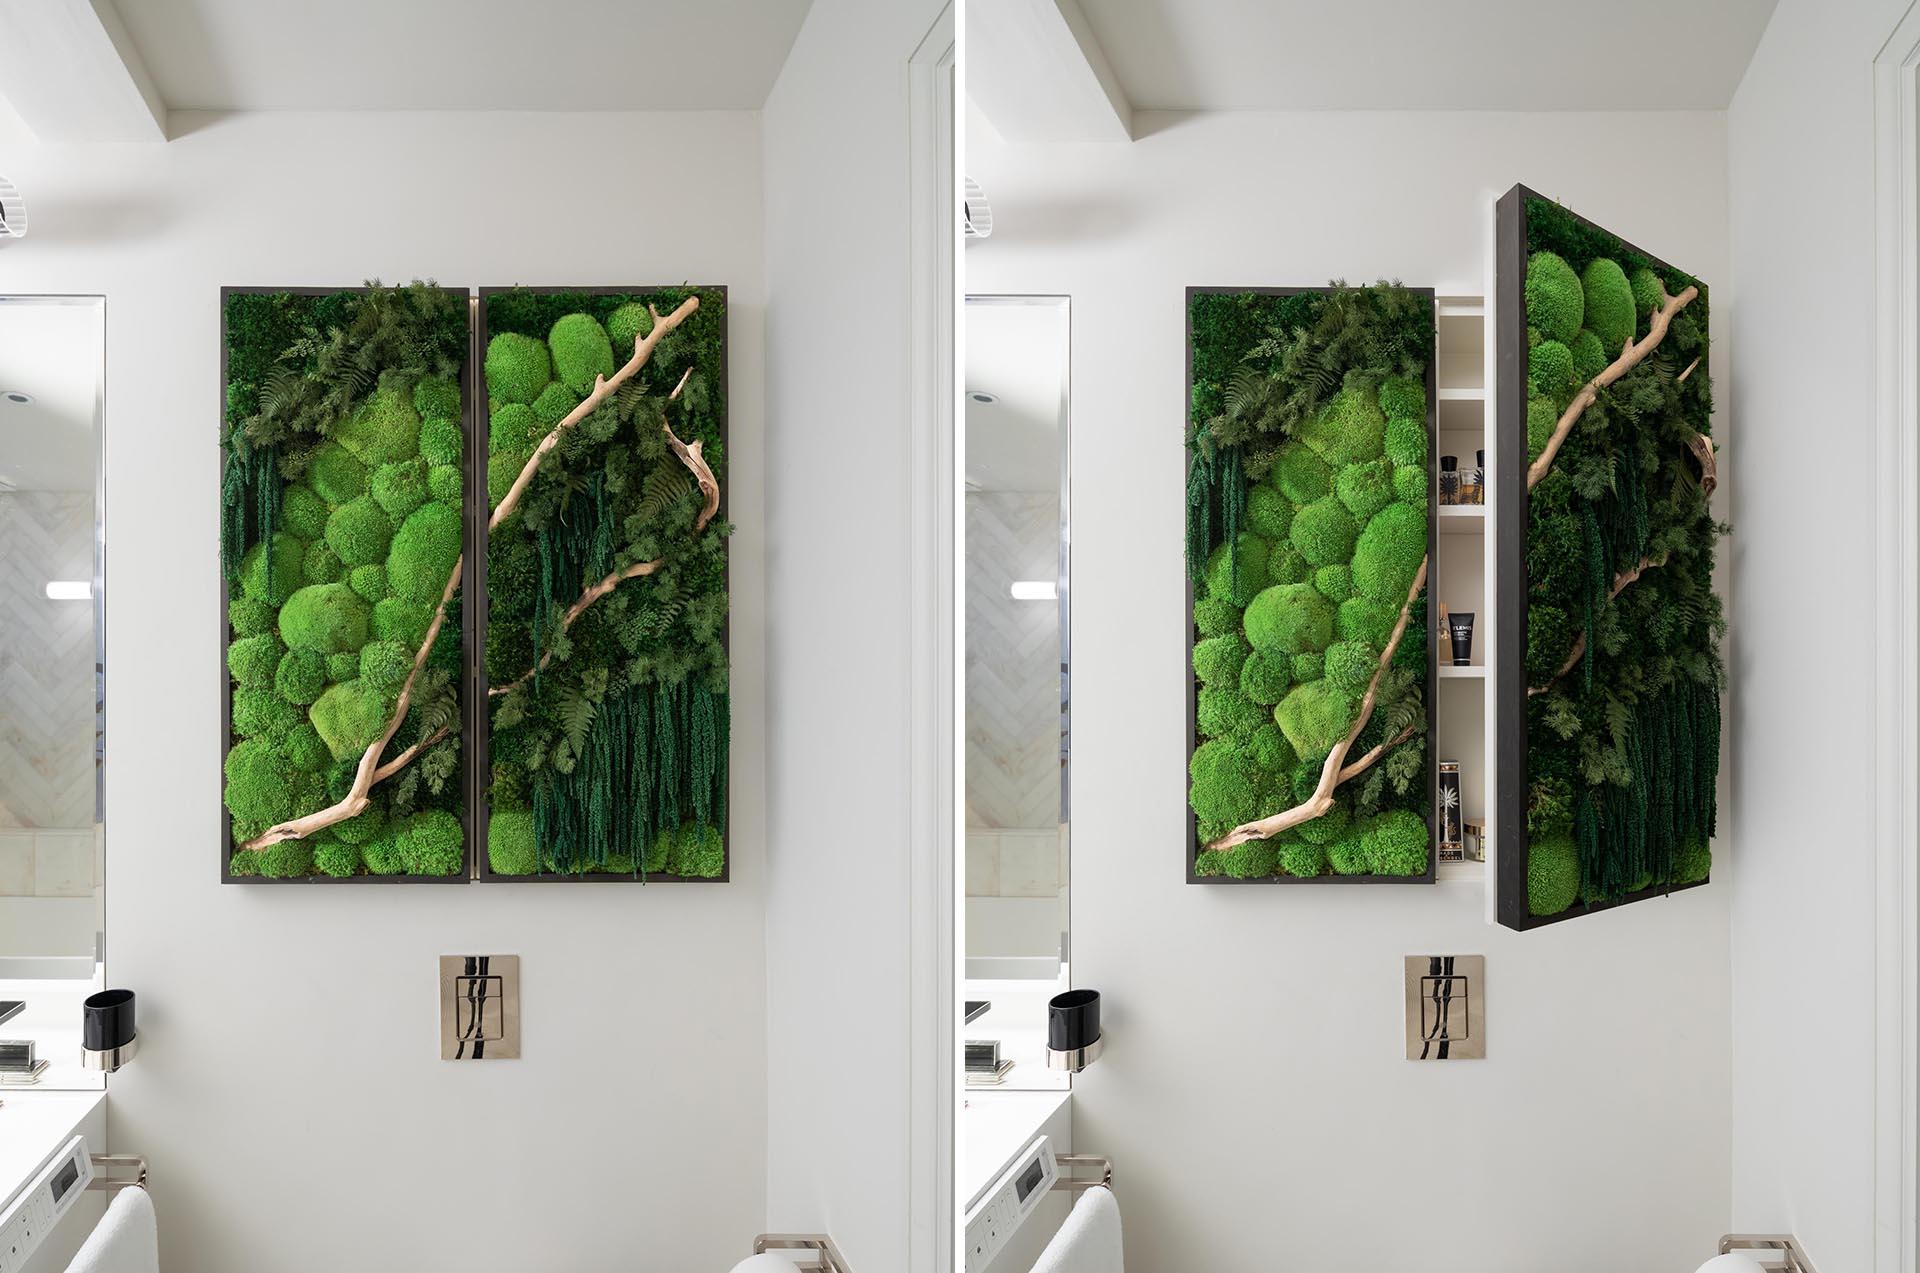 A modern bathroom cabinet with greenery.